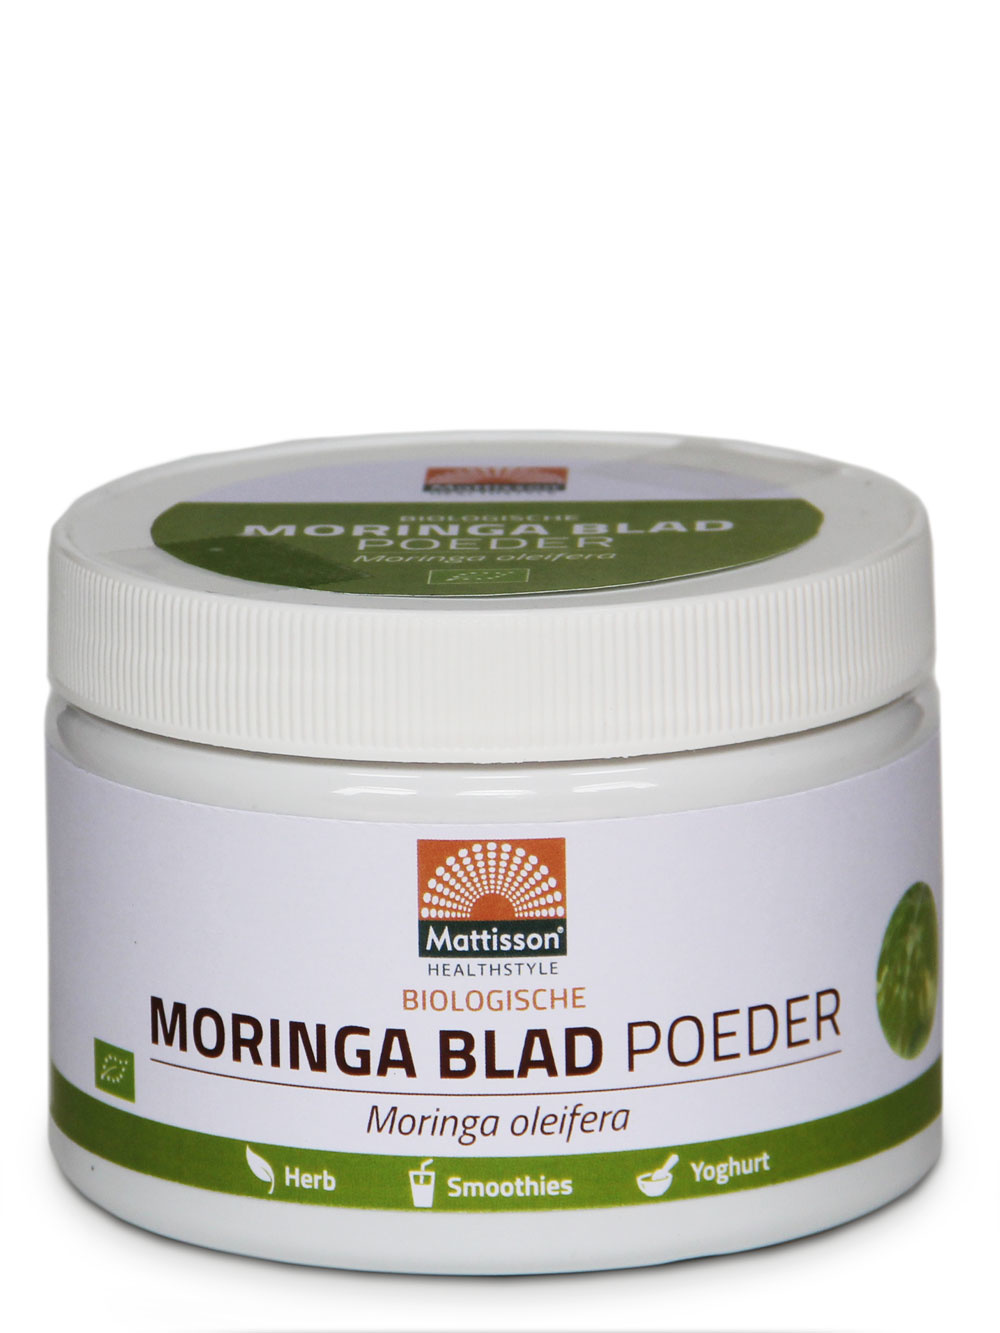 Mattisson Moringa Blad Poeder  Absolute  Bio Raw 125 gram